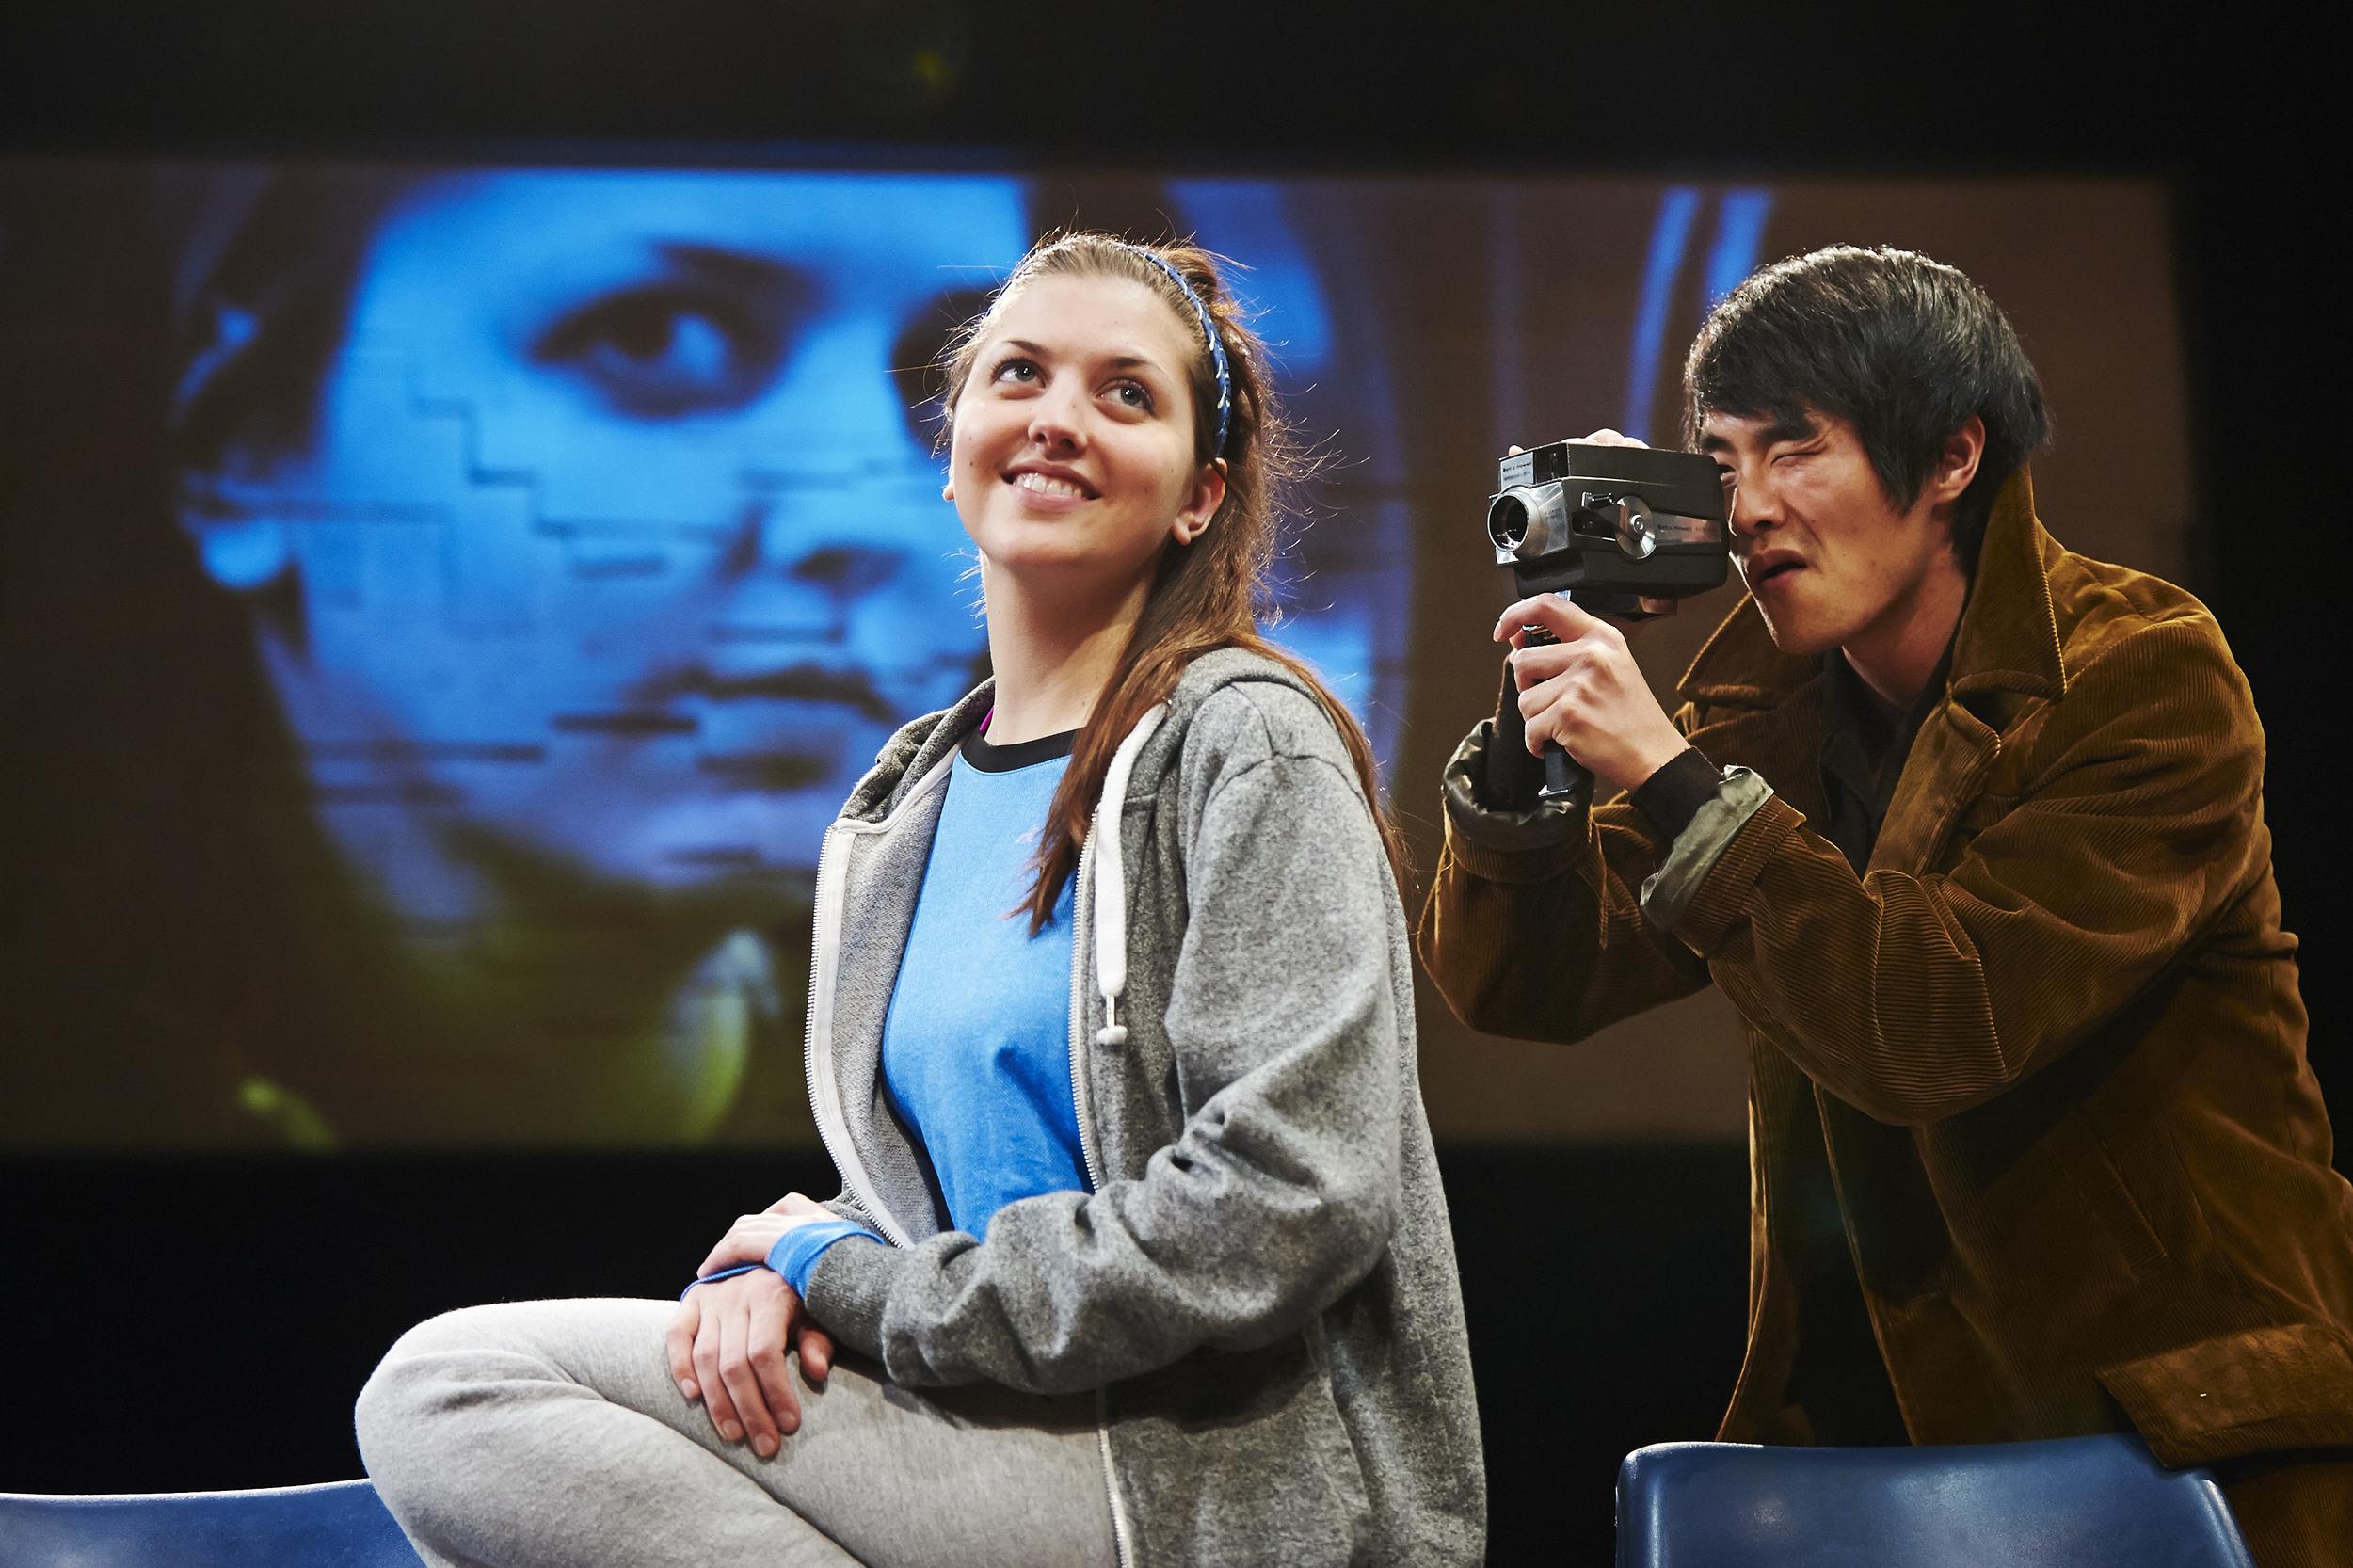 Oblivion Website - Julie, Bernard filming vid in background.jpg